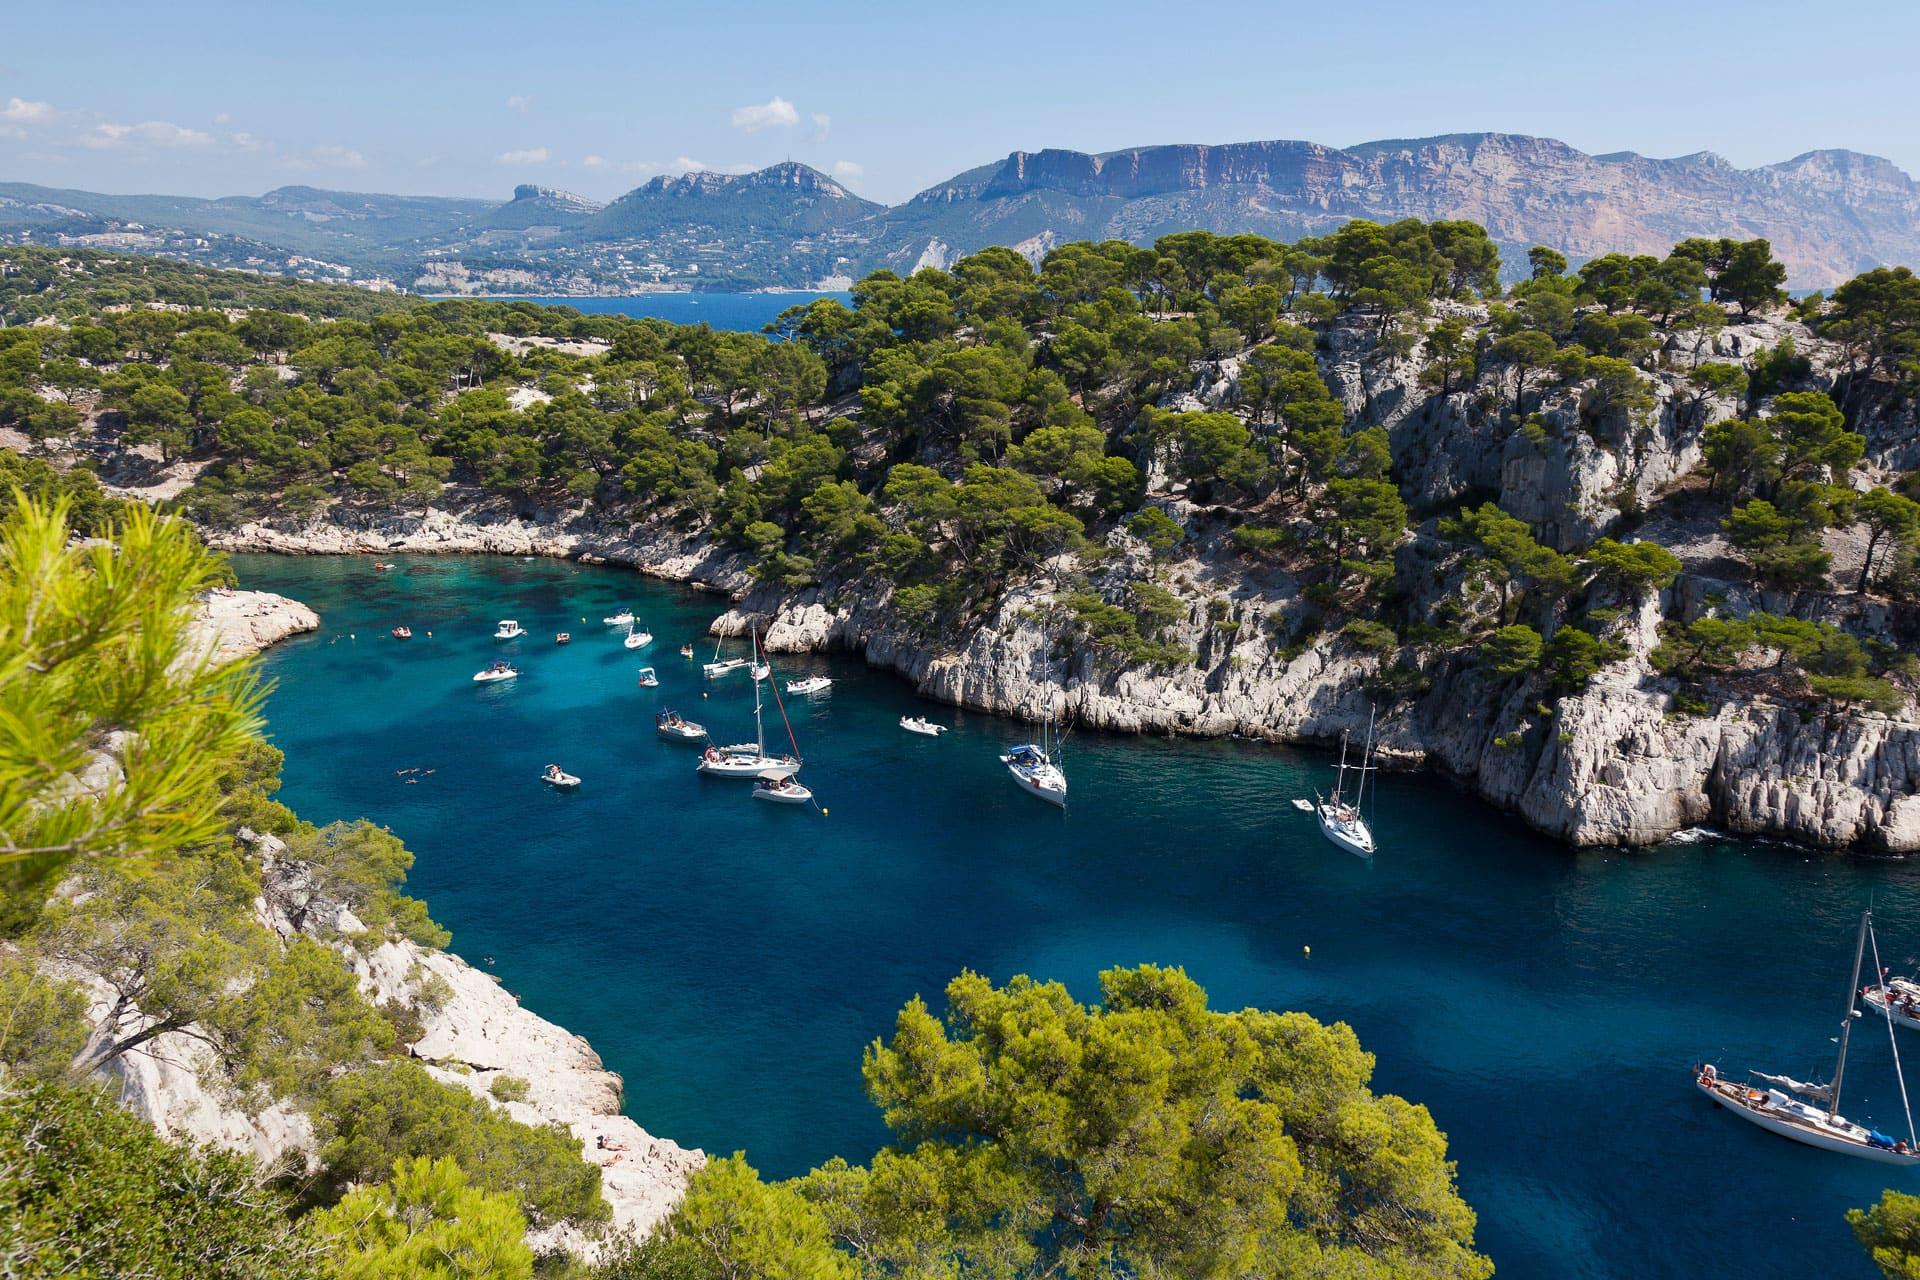 Mooiste vakantiebestemmingen in Europa